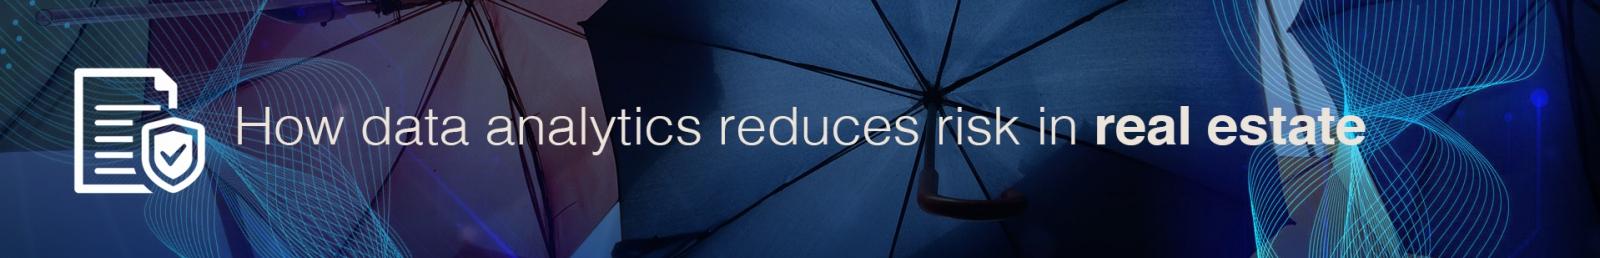 Data analytics insurance commercial property